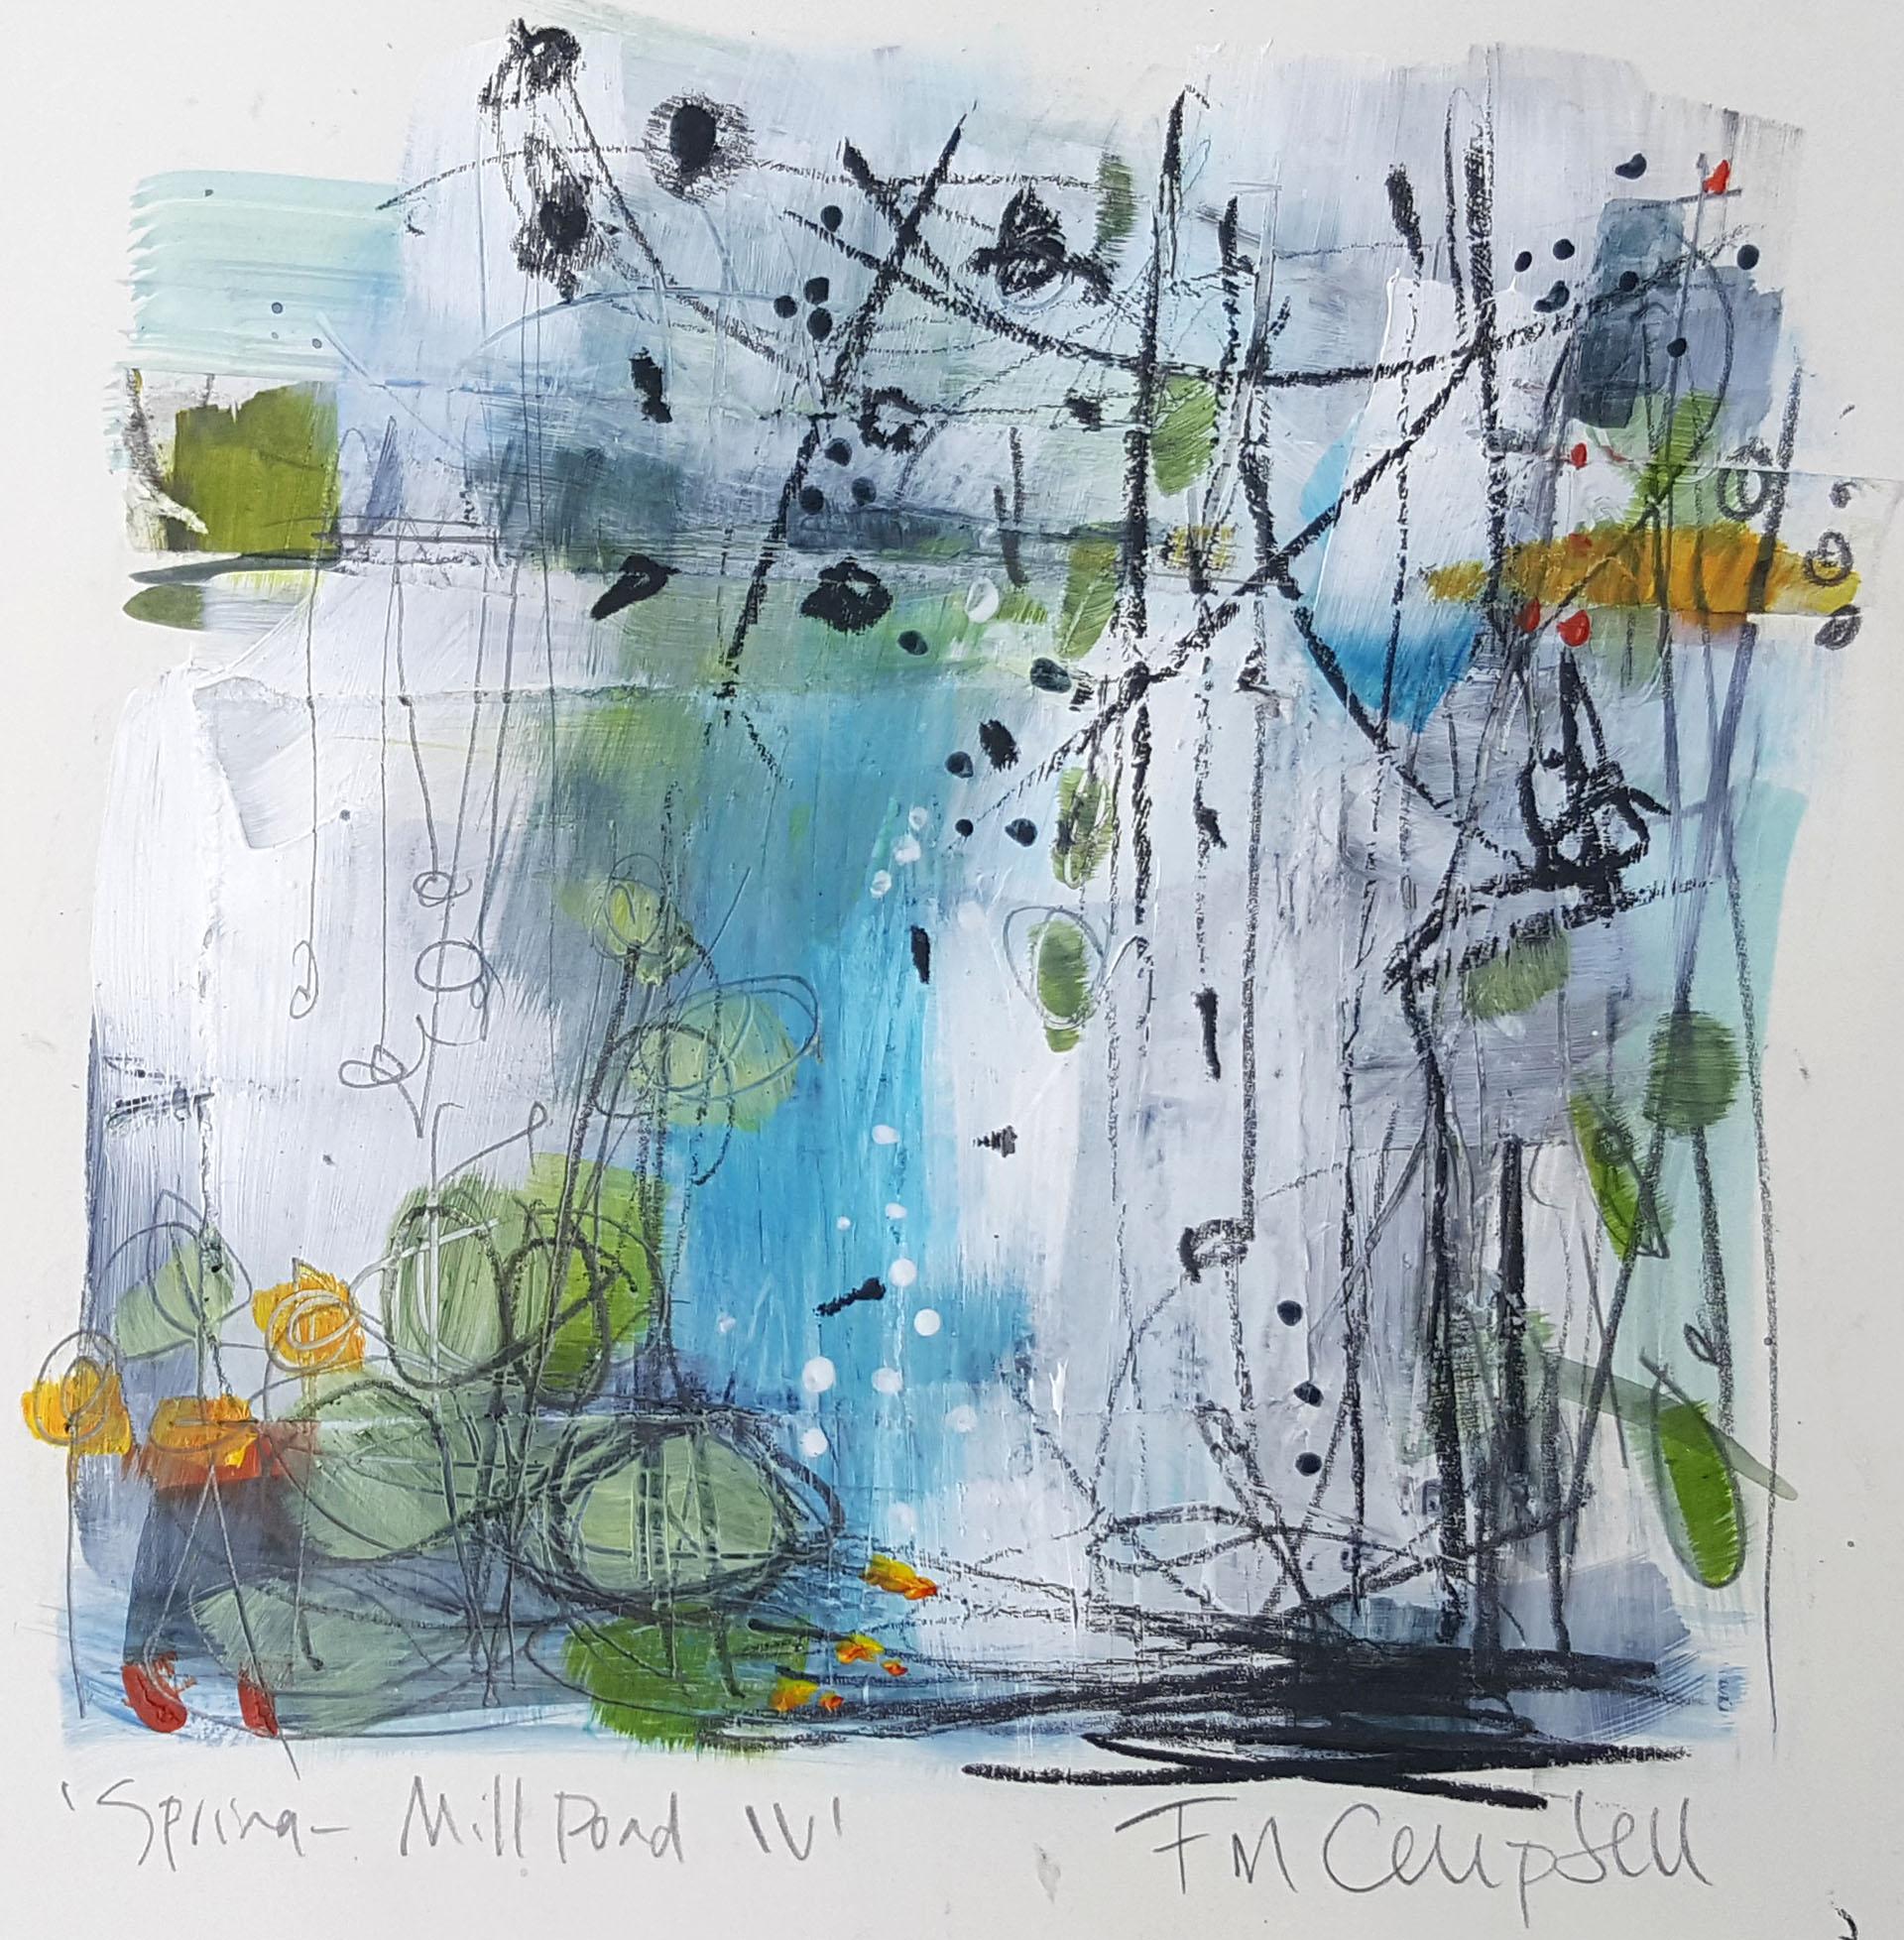 'Spring - Mill Pond IV'